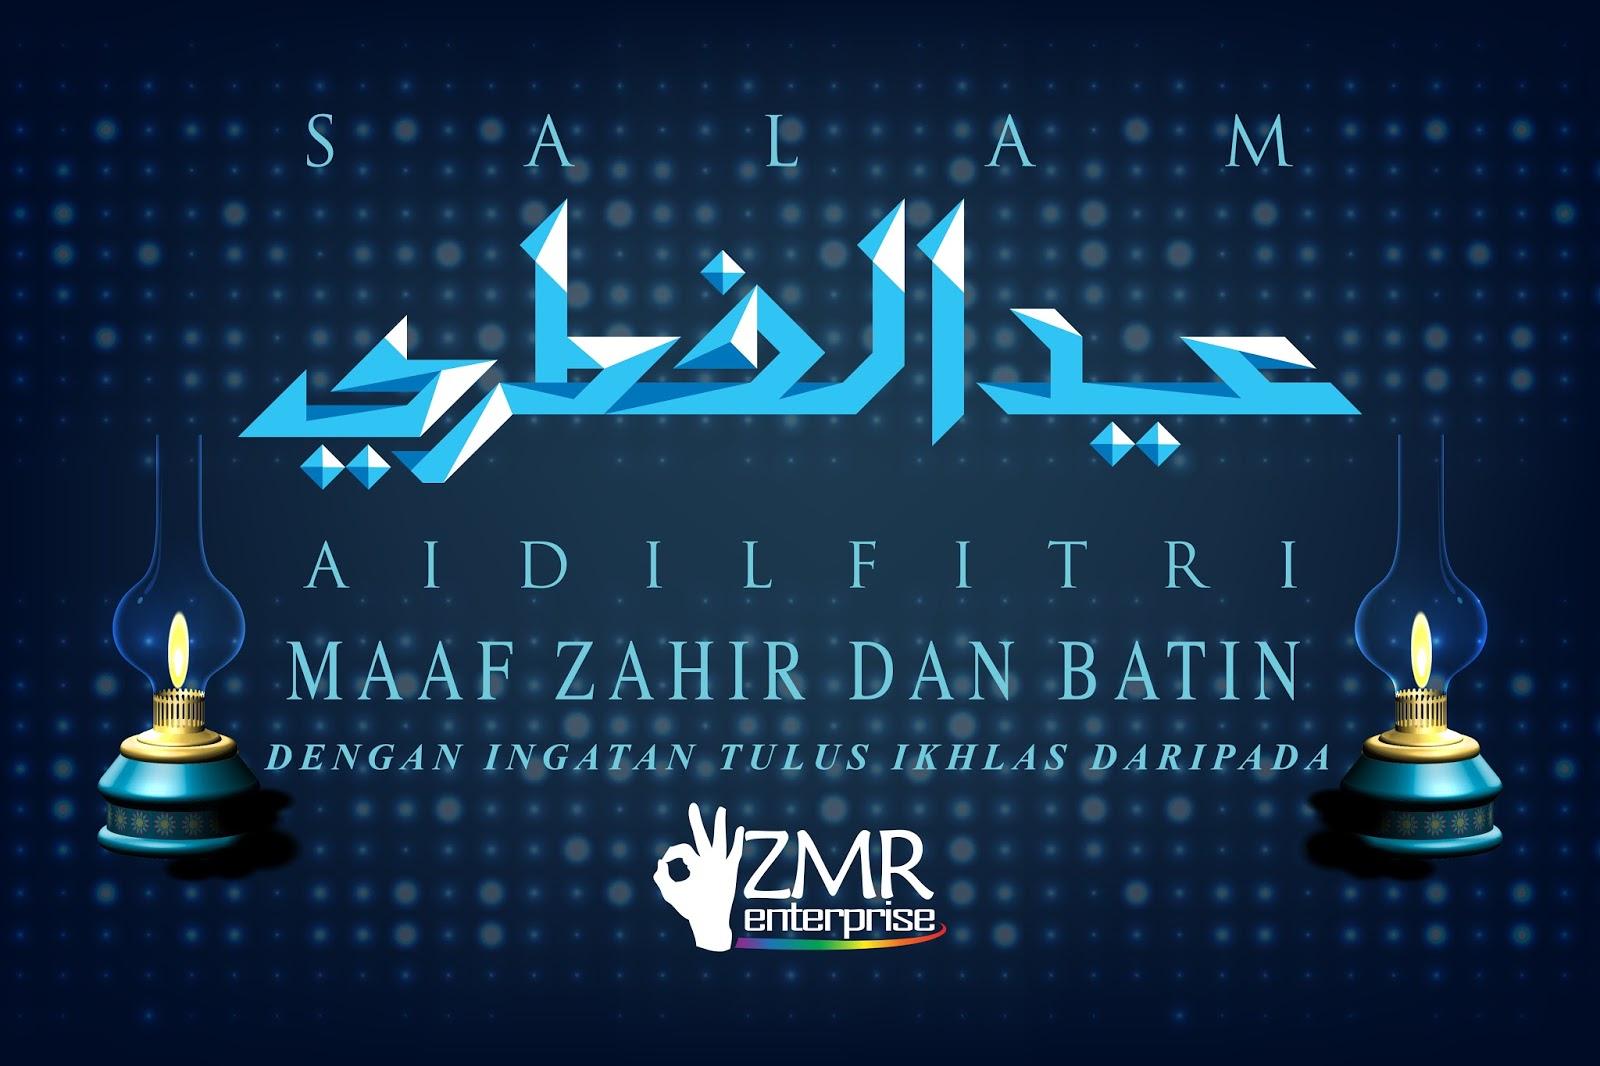 Signboard Murah Selamat Hari Raya Aidilfitri Maaf Zahir